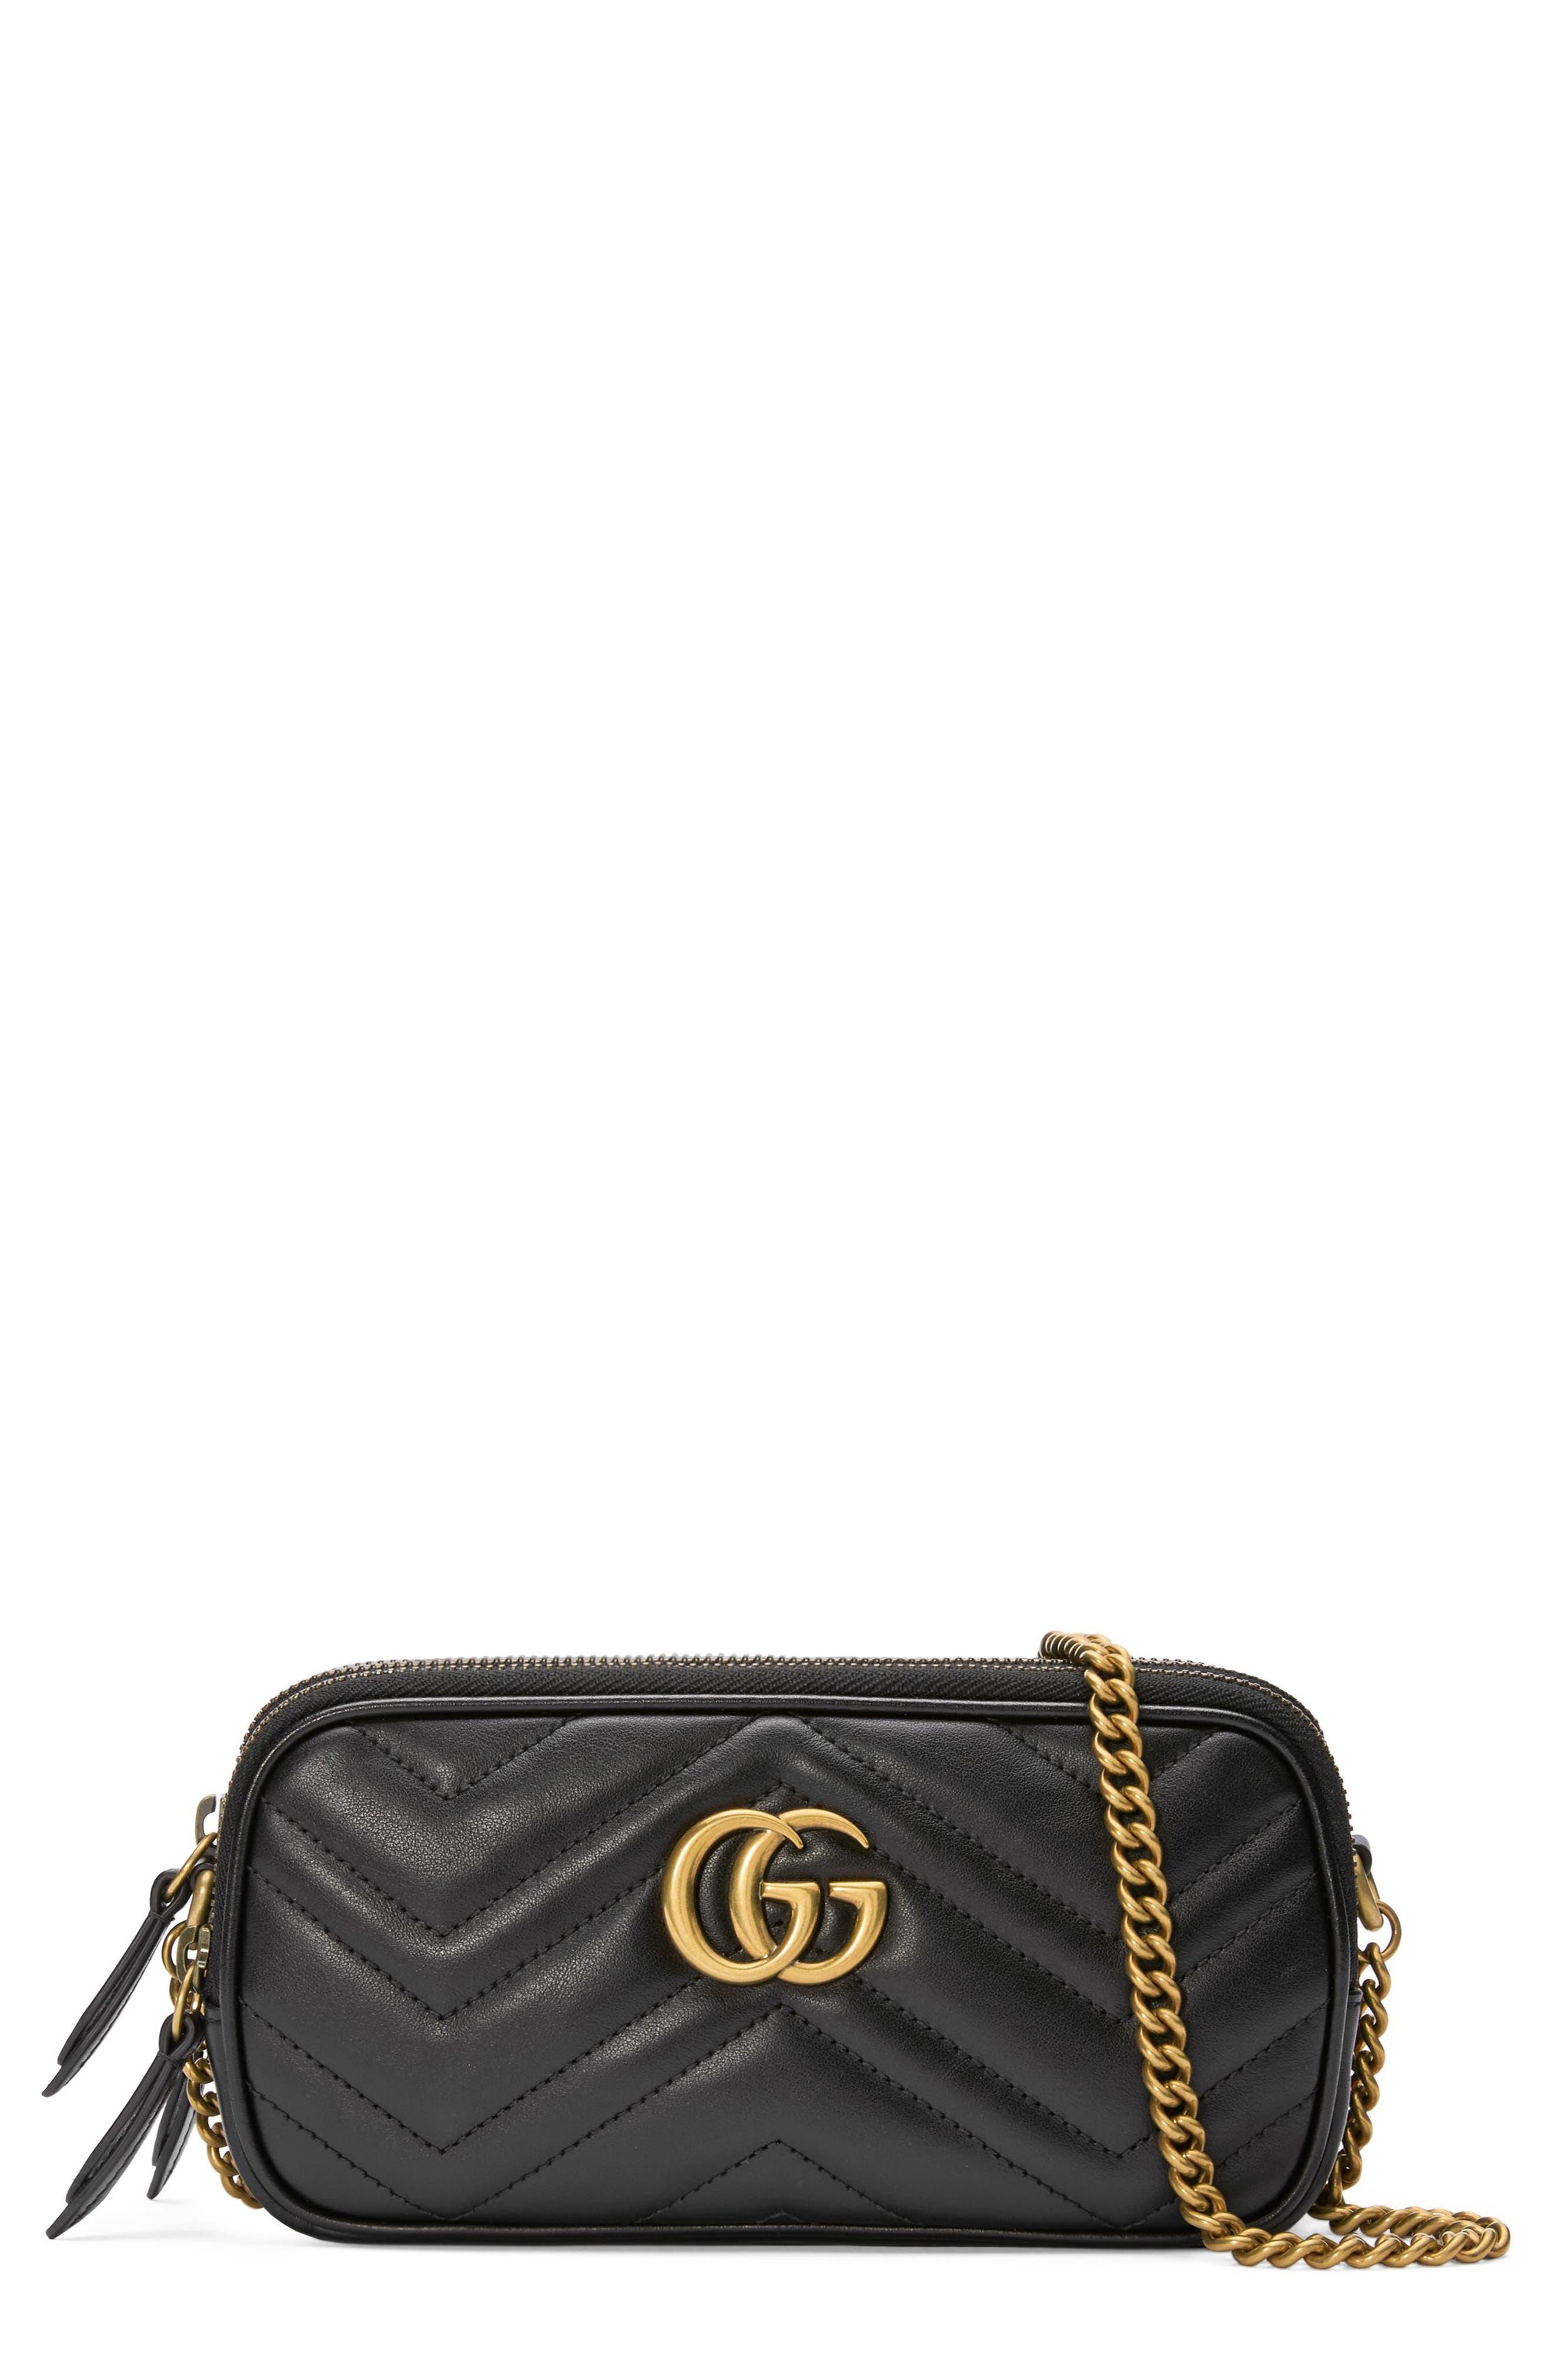 Marmont 2.0 Leather Crossbody Bag,                         Main,                         color, NERO